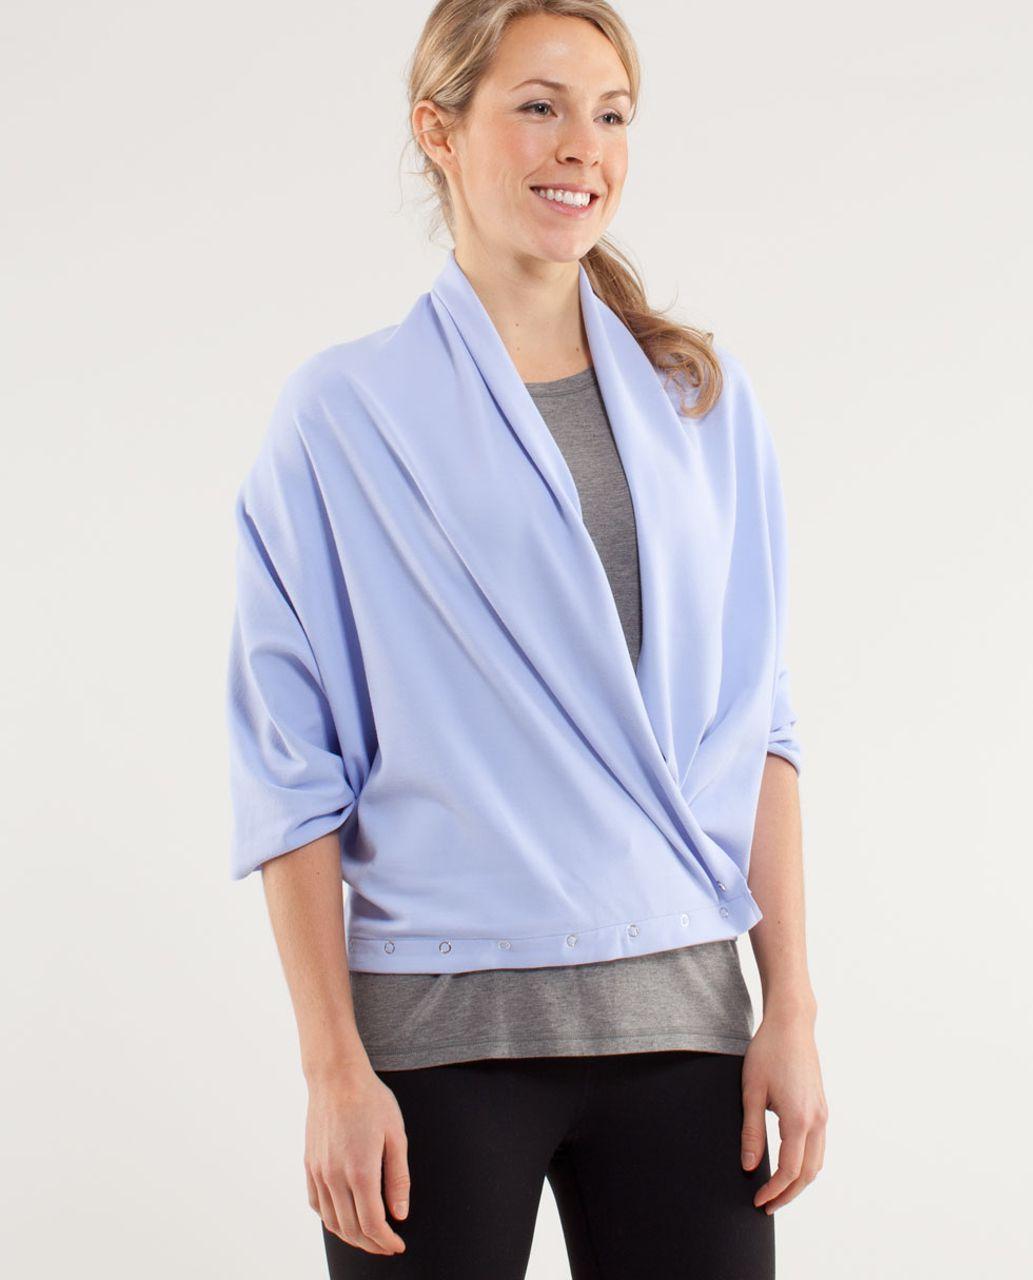 lululemon vinyasa scarf rulu lavender dusk heathered